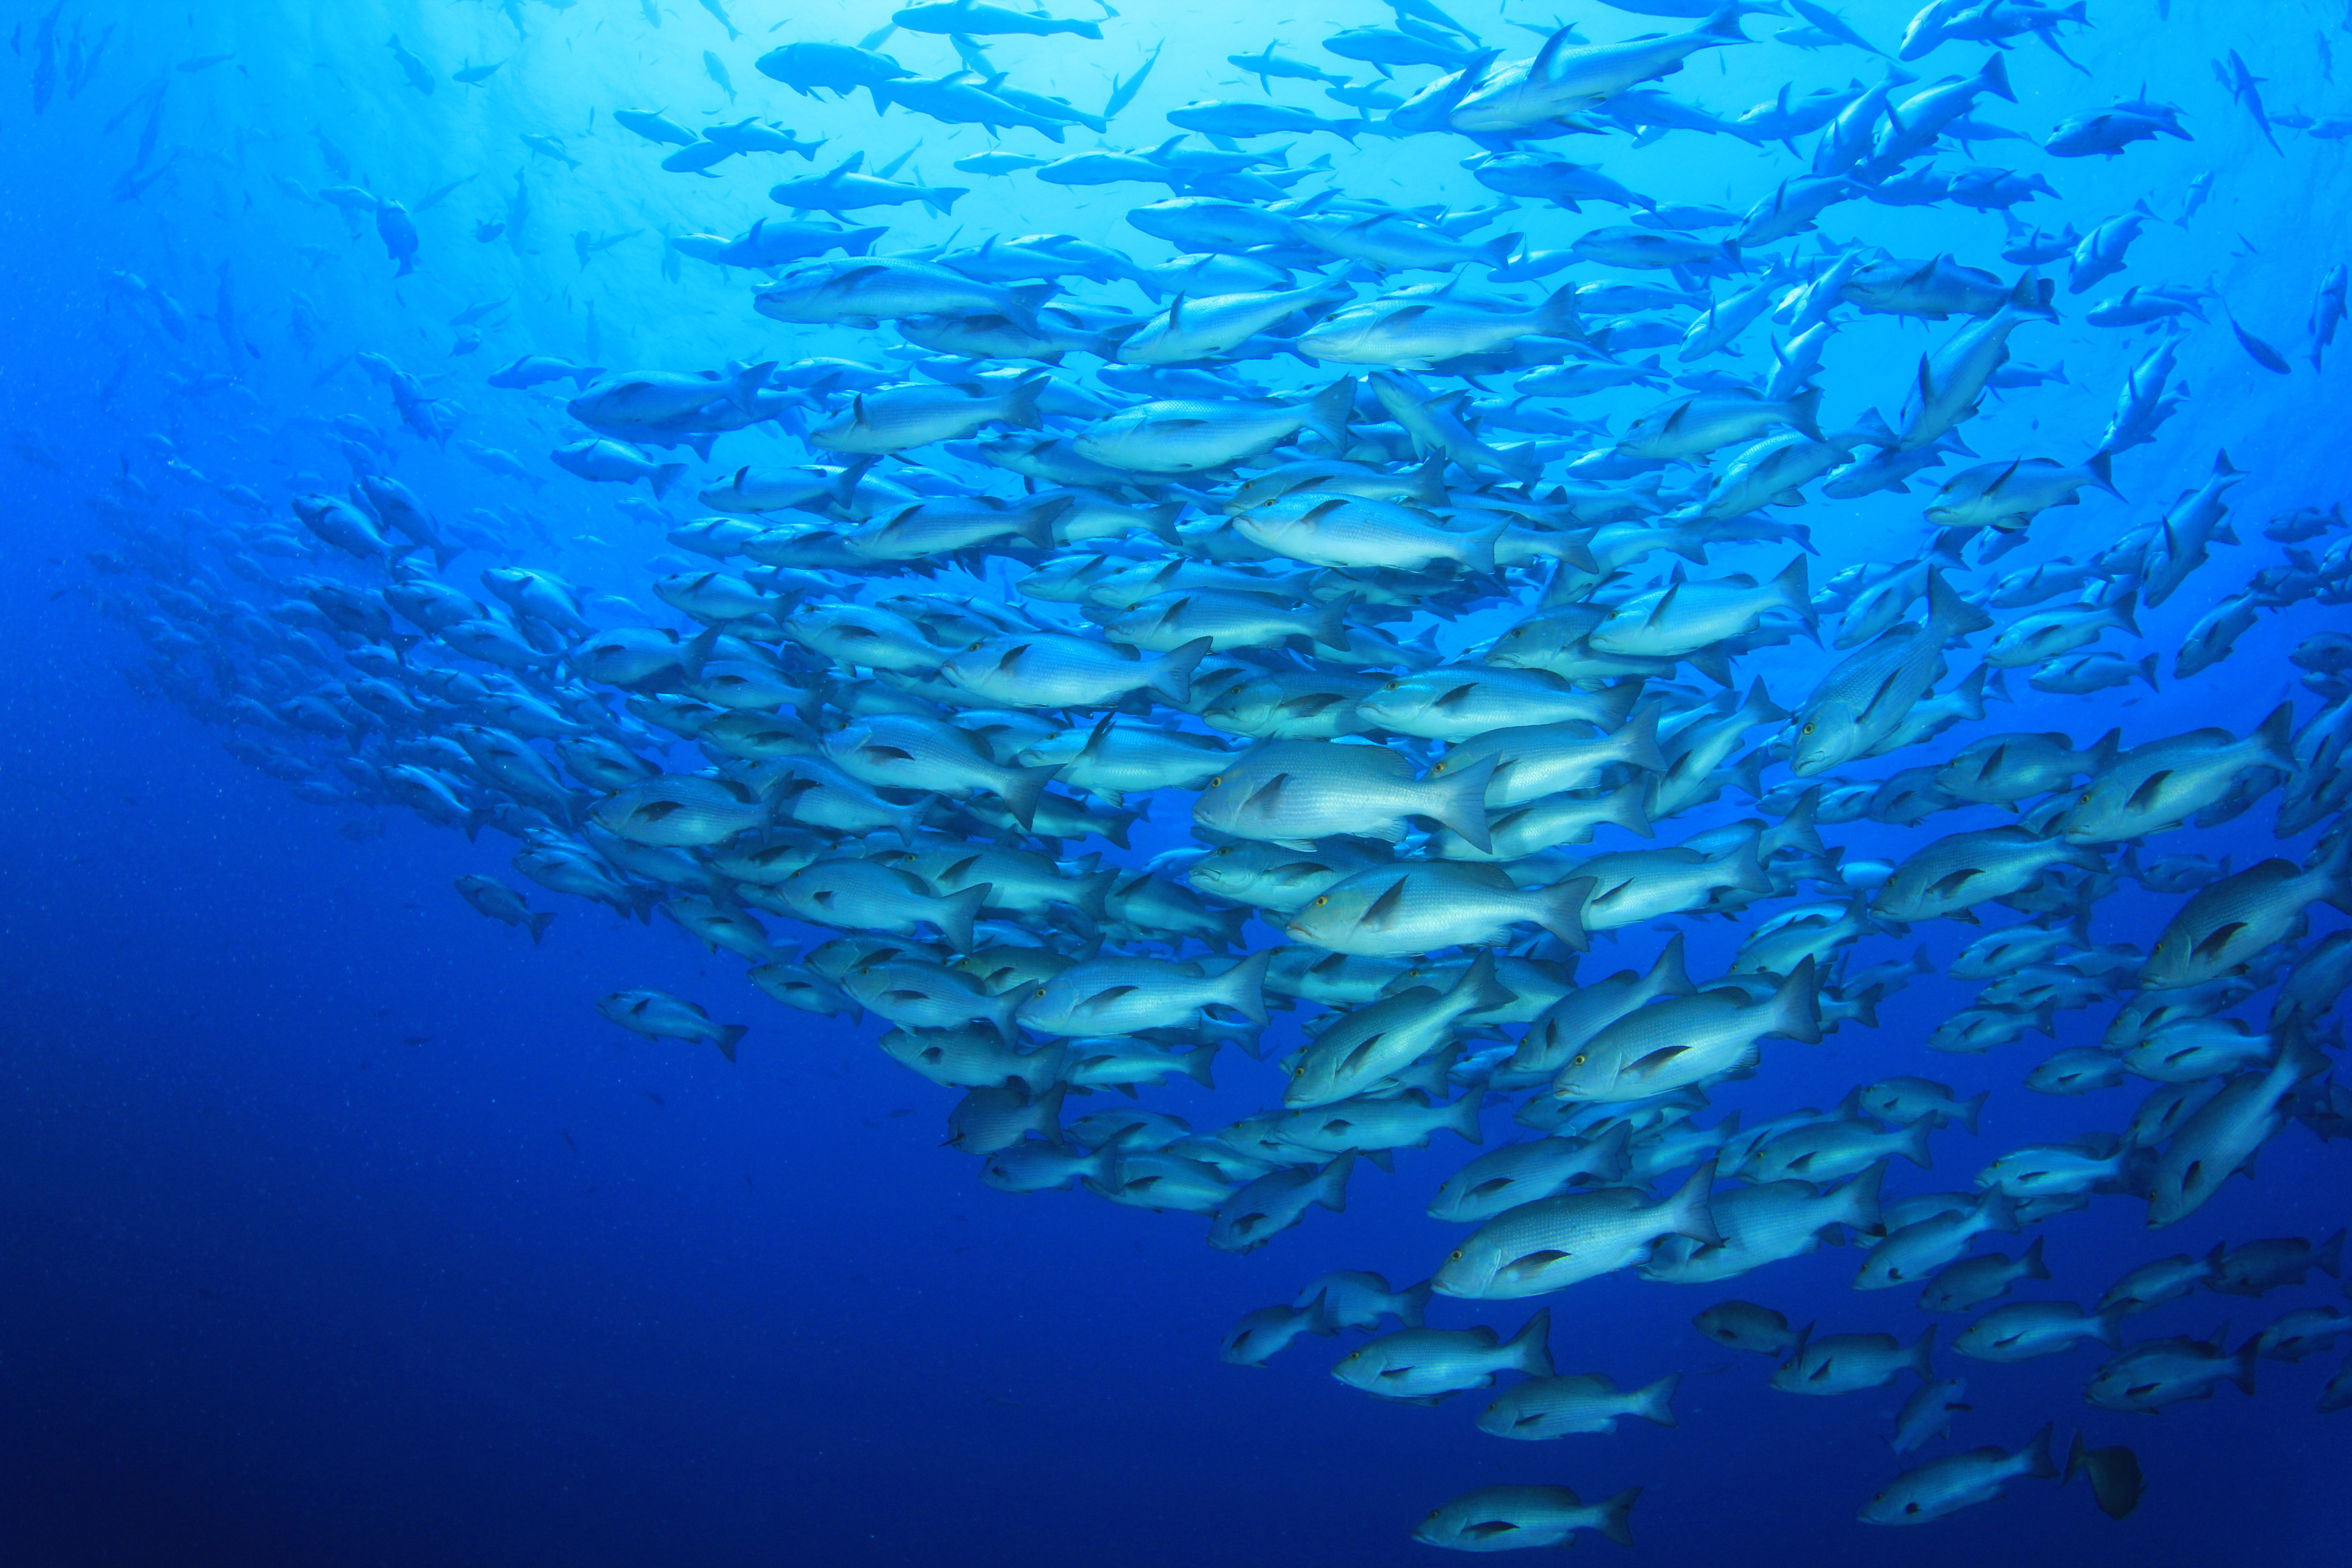 British Ecological Society image of shoal of fish